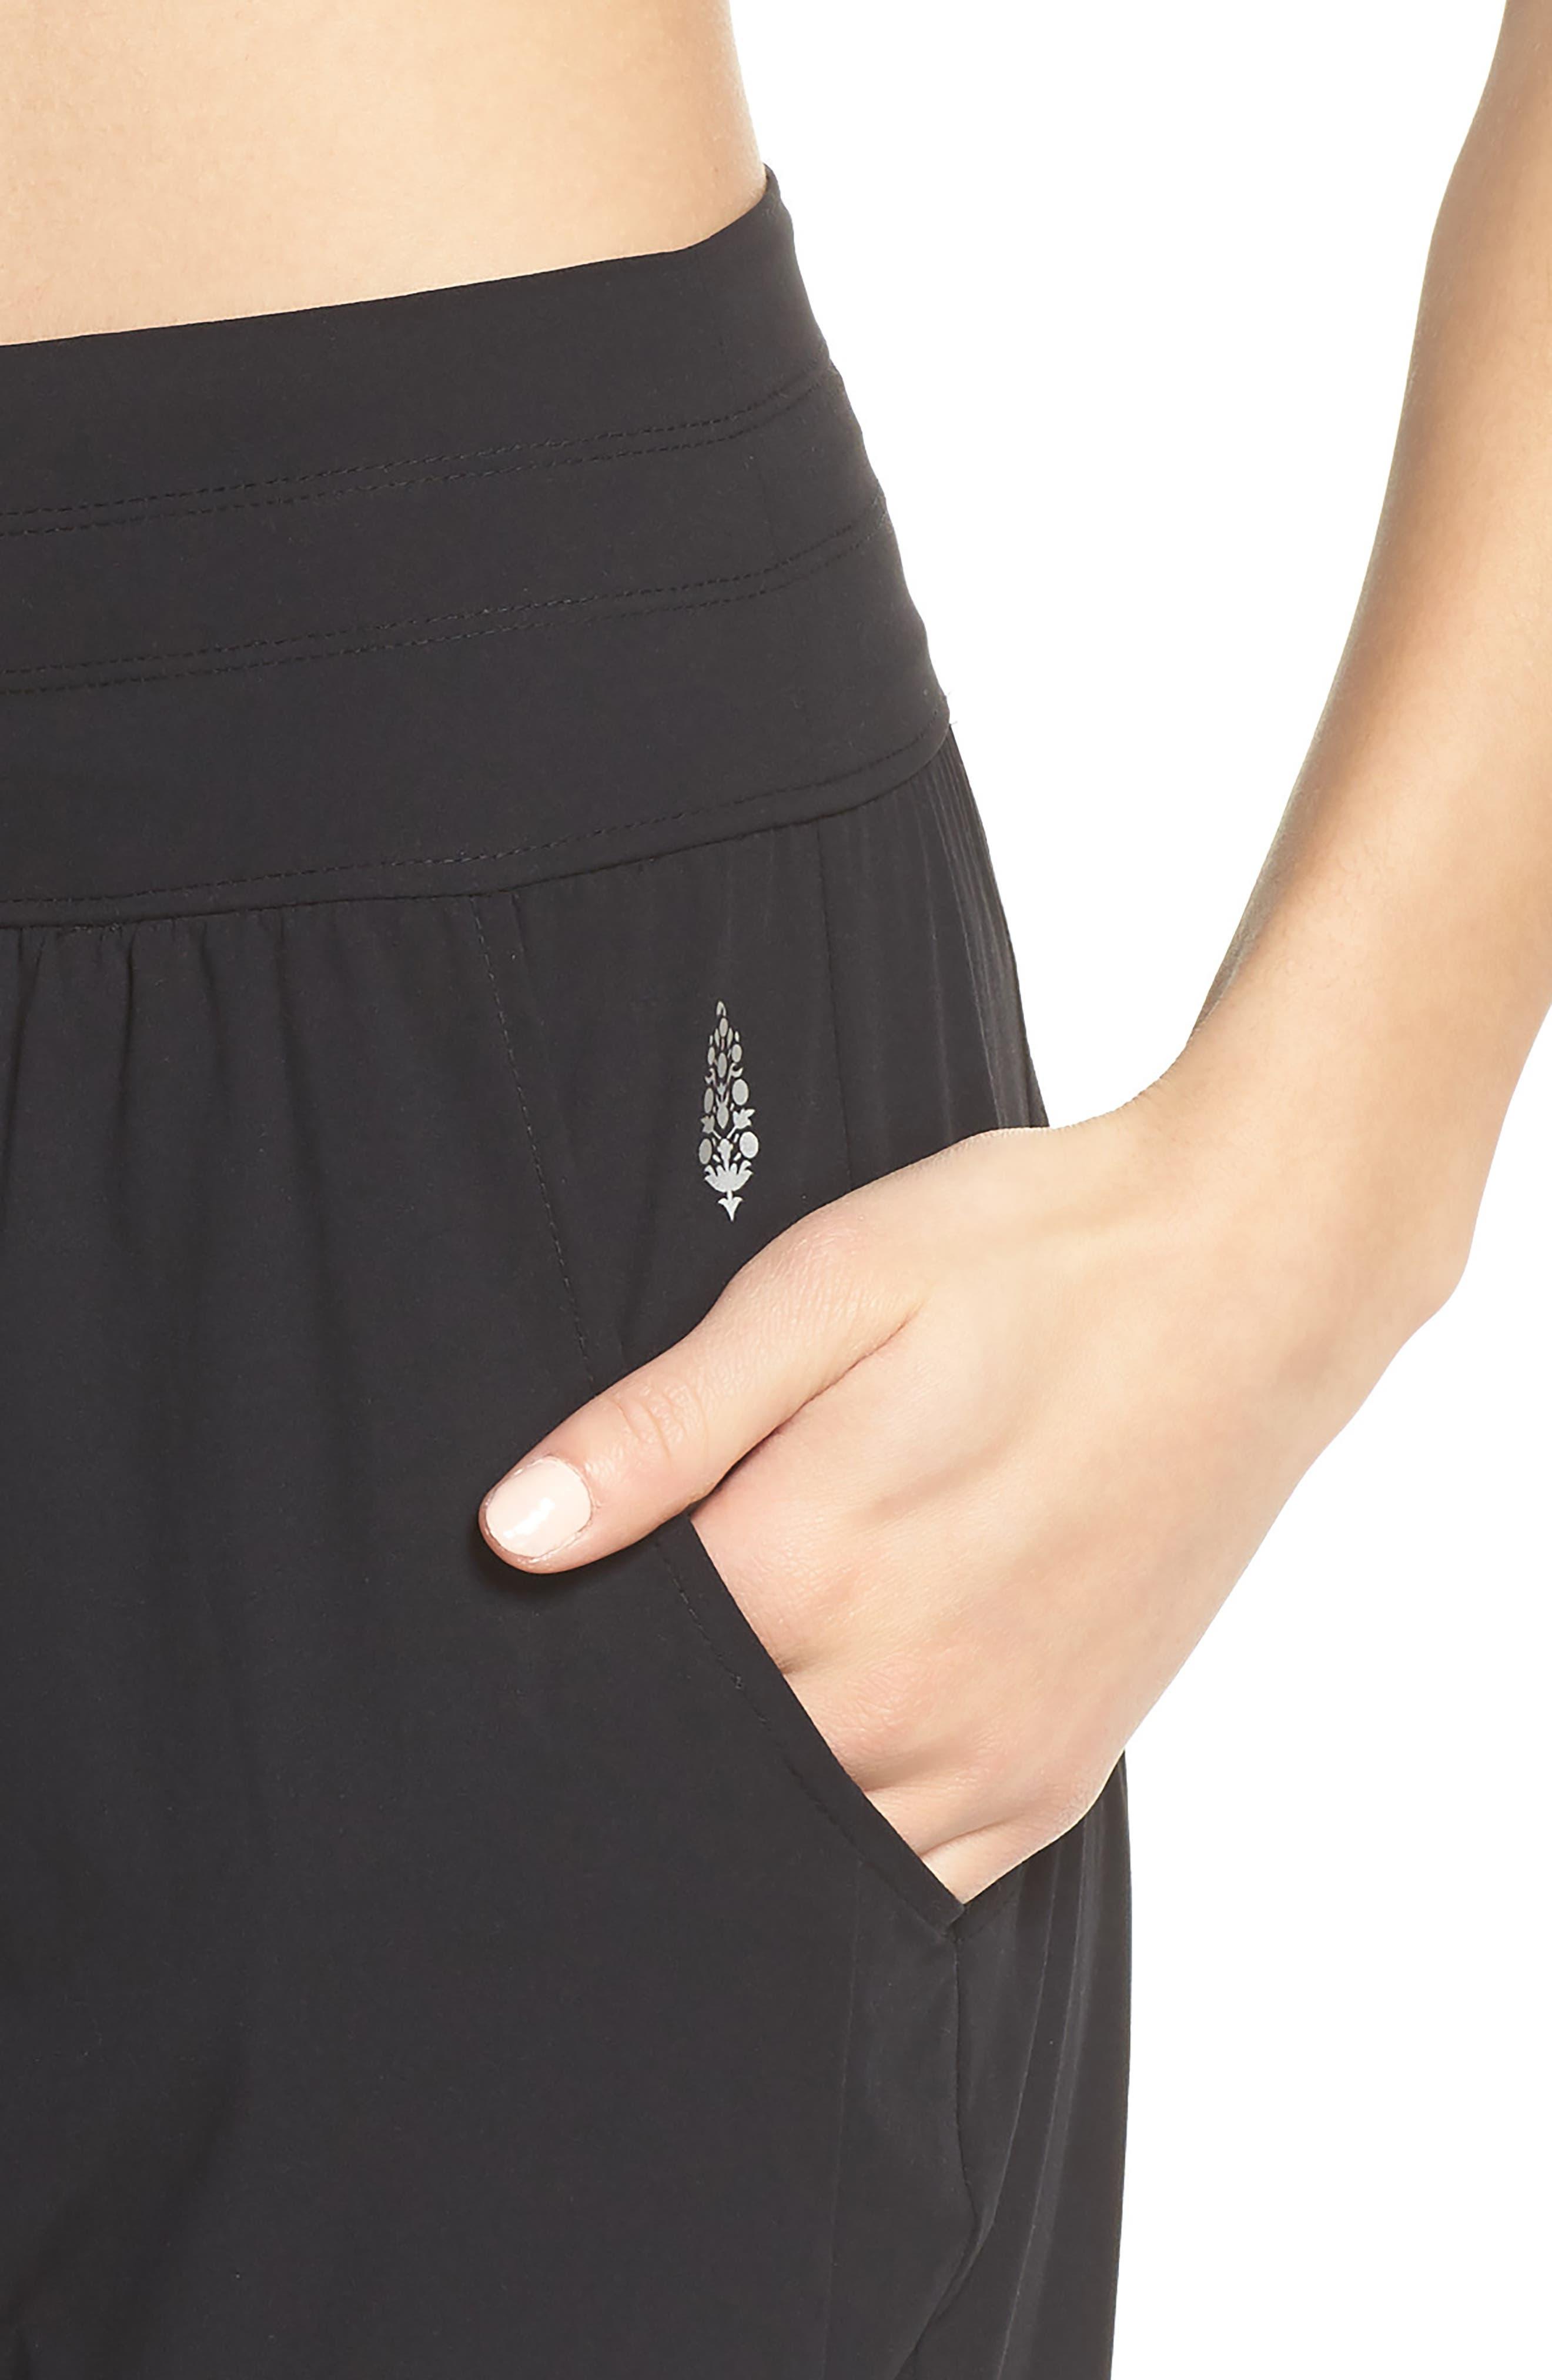 Cardio Harem Pants,                             Alternate thumbnail 4, color,                             Black